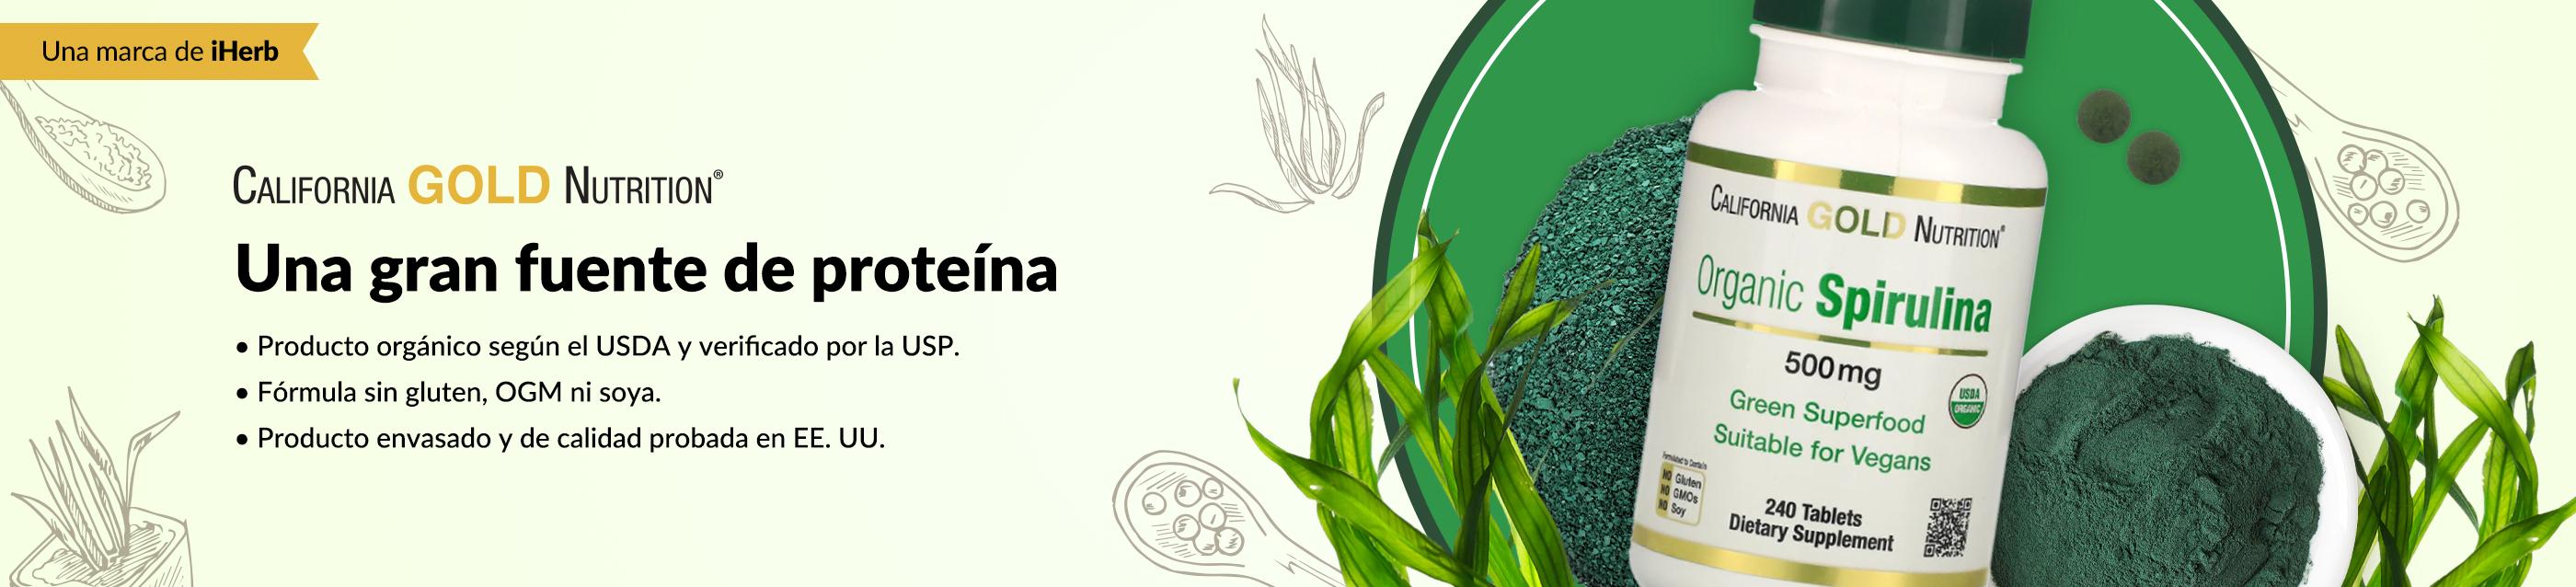 CGN Spirulina